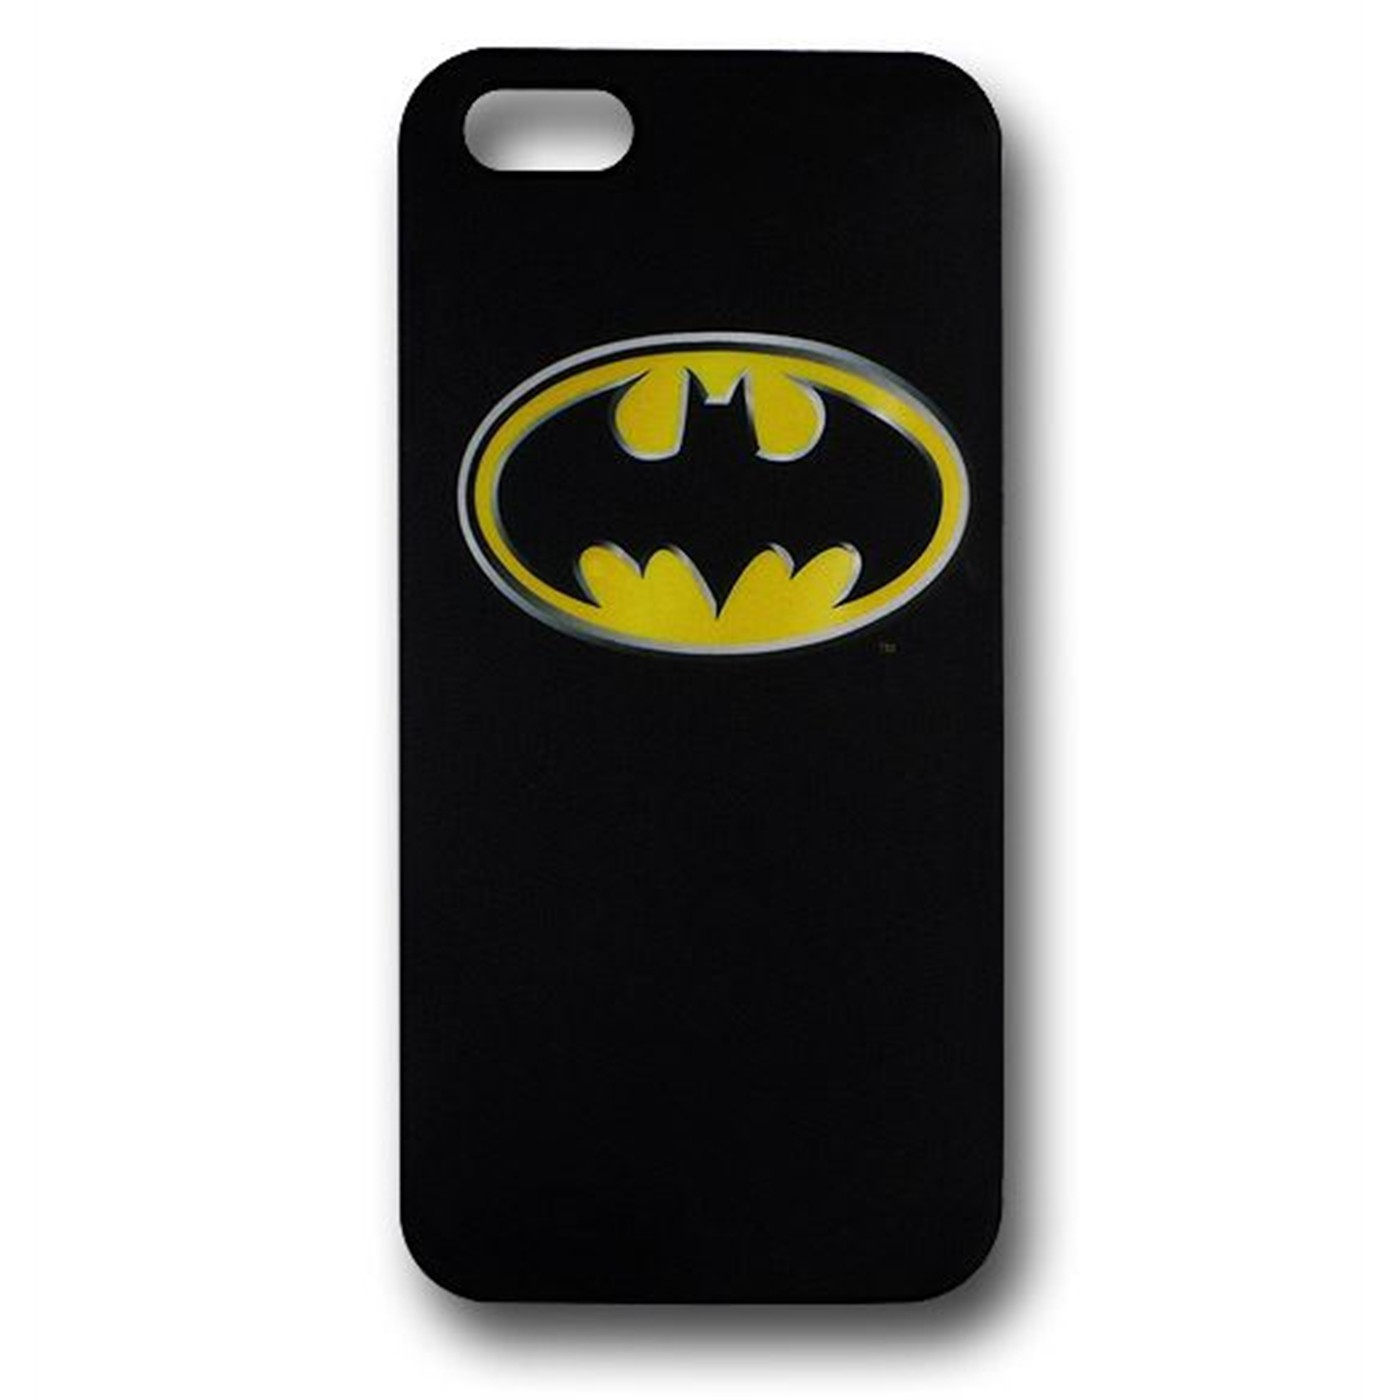 Batman Symbol iPhone 5 Hard Case